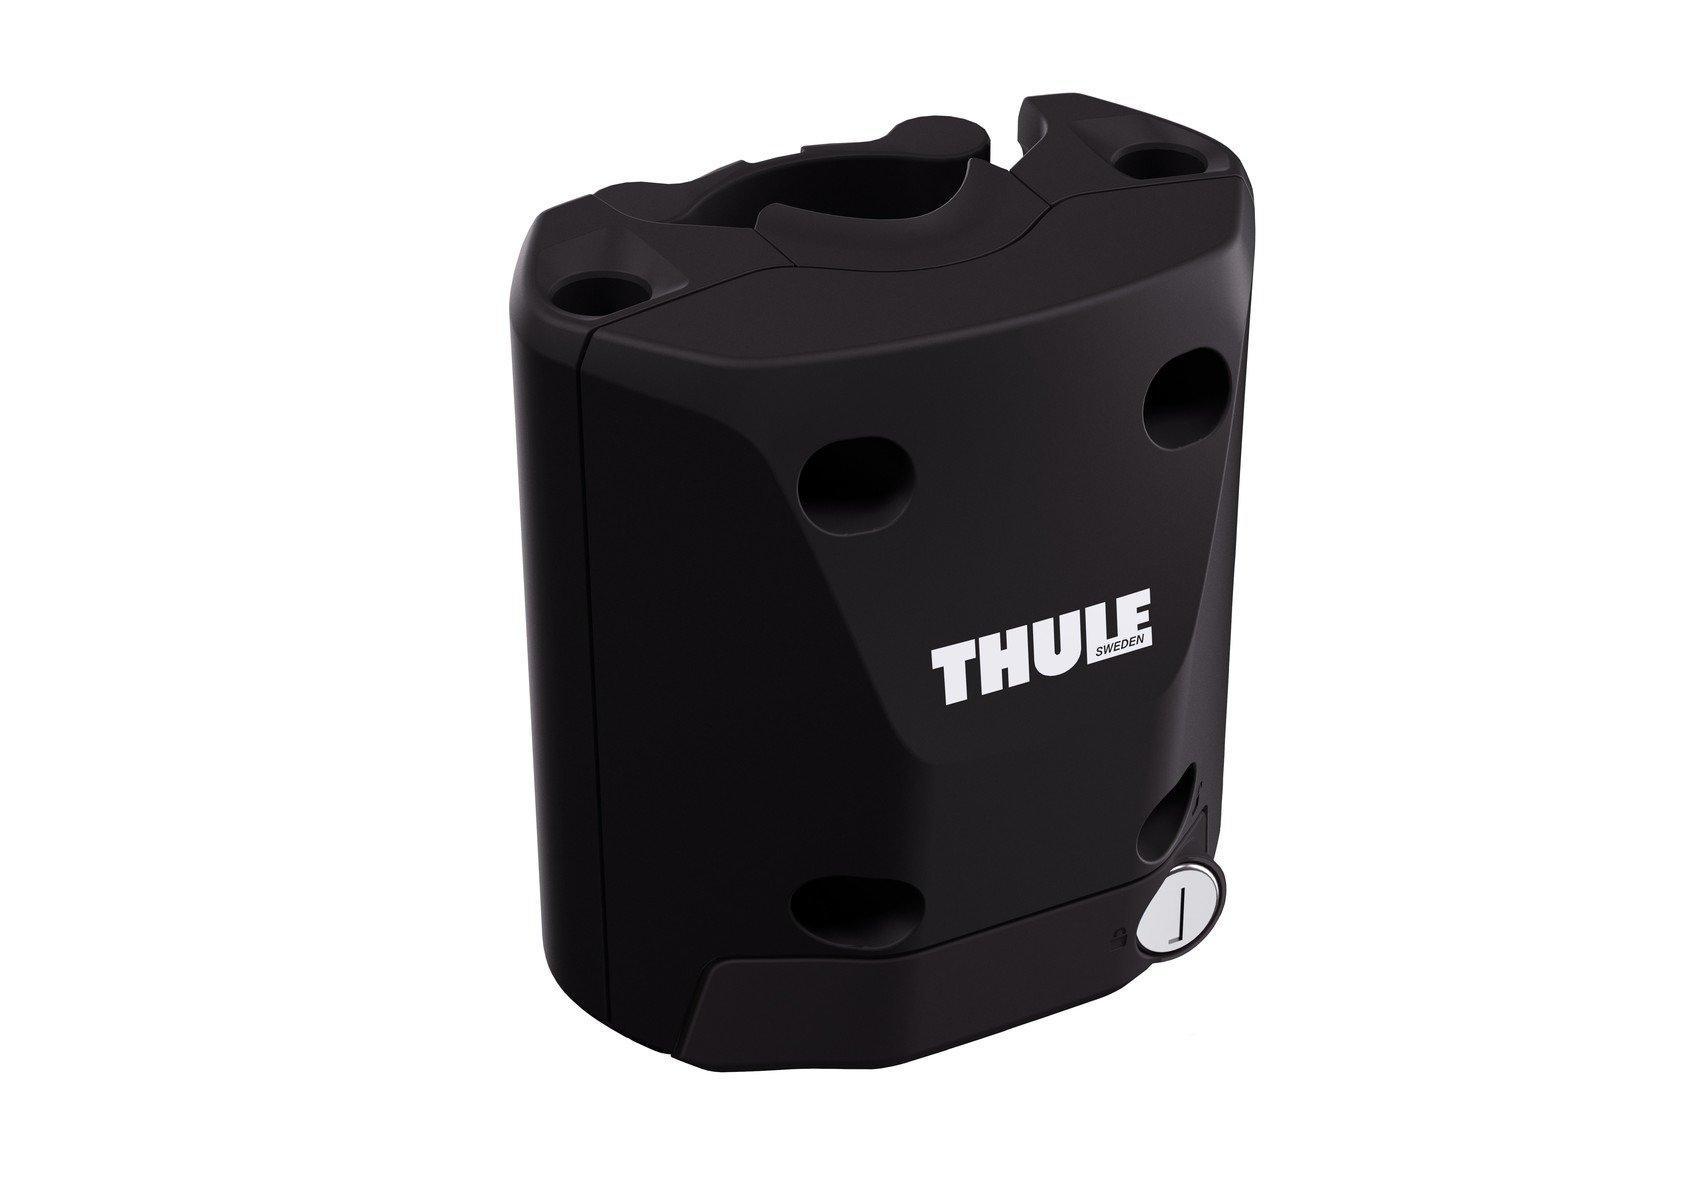 Thule RideAlong - Uchwyt mocujący Quick